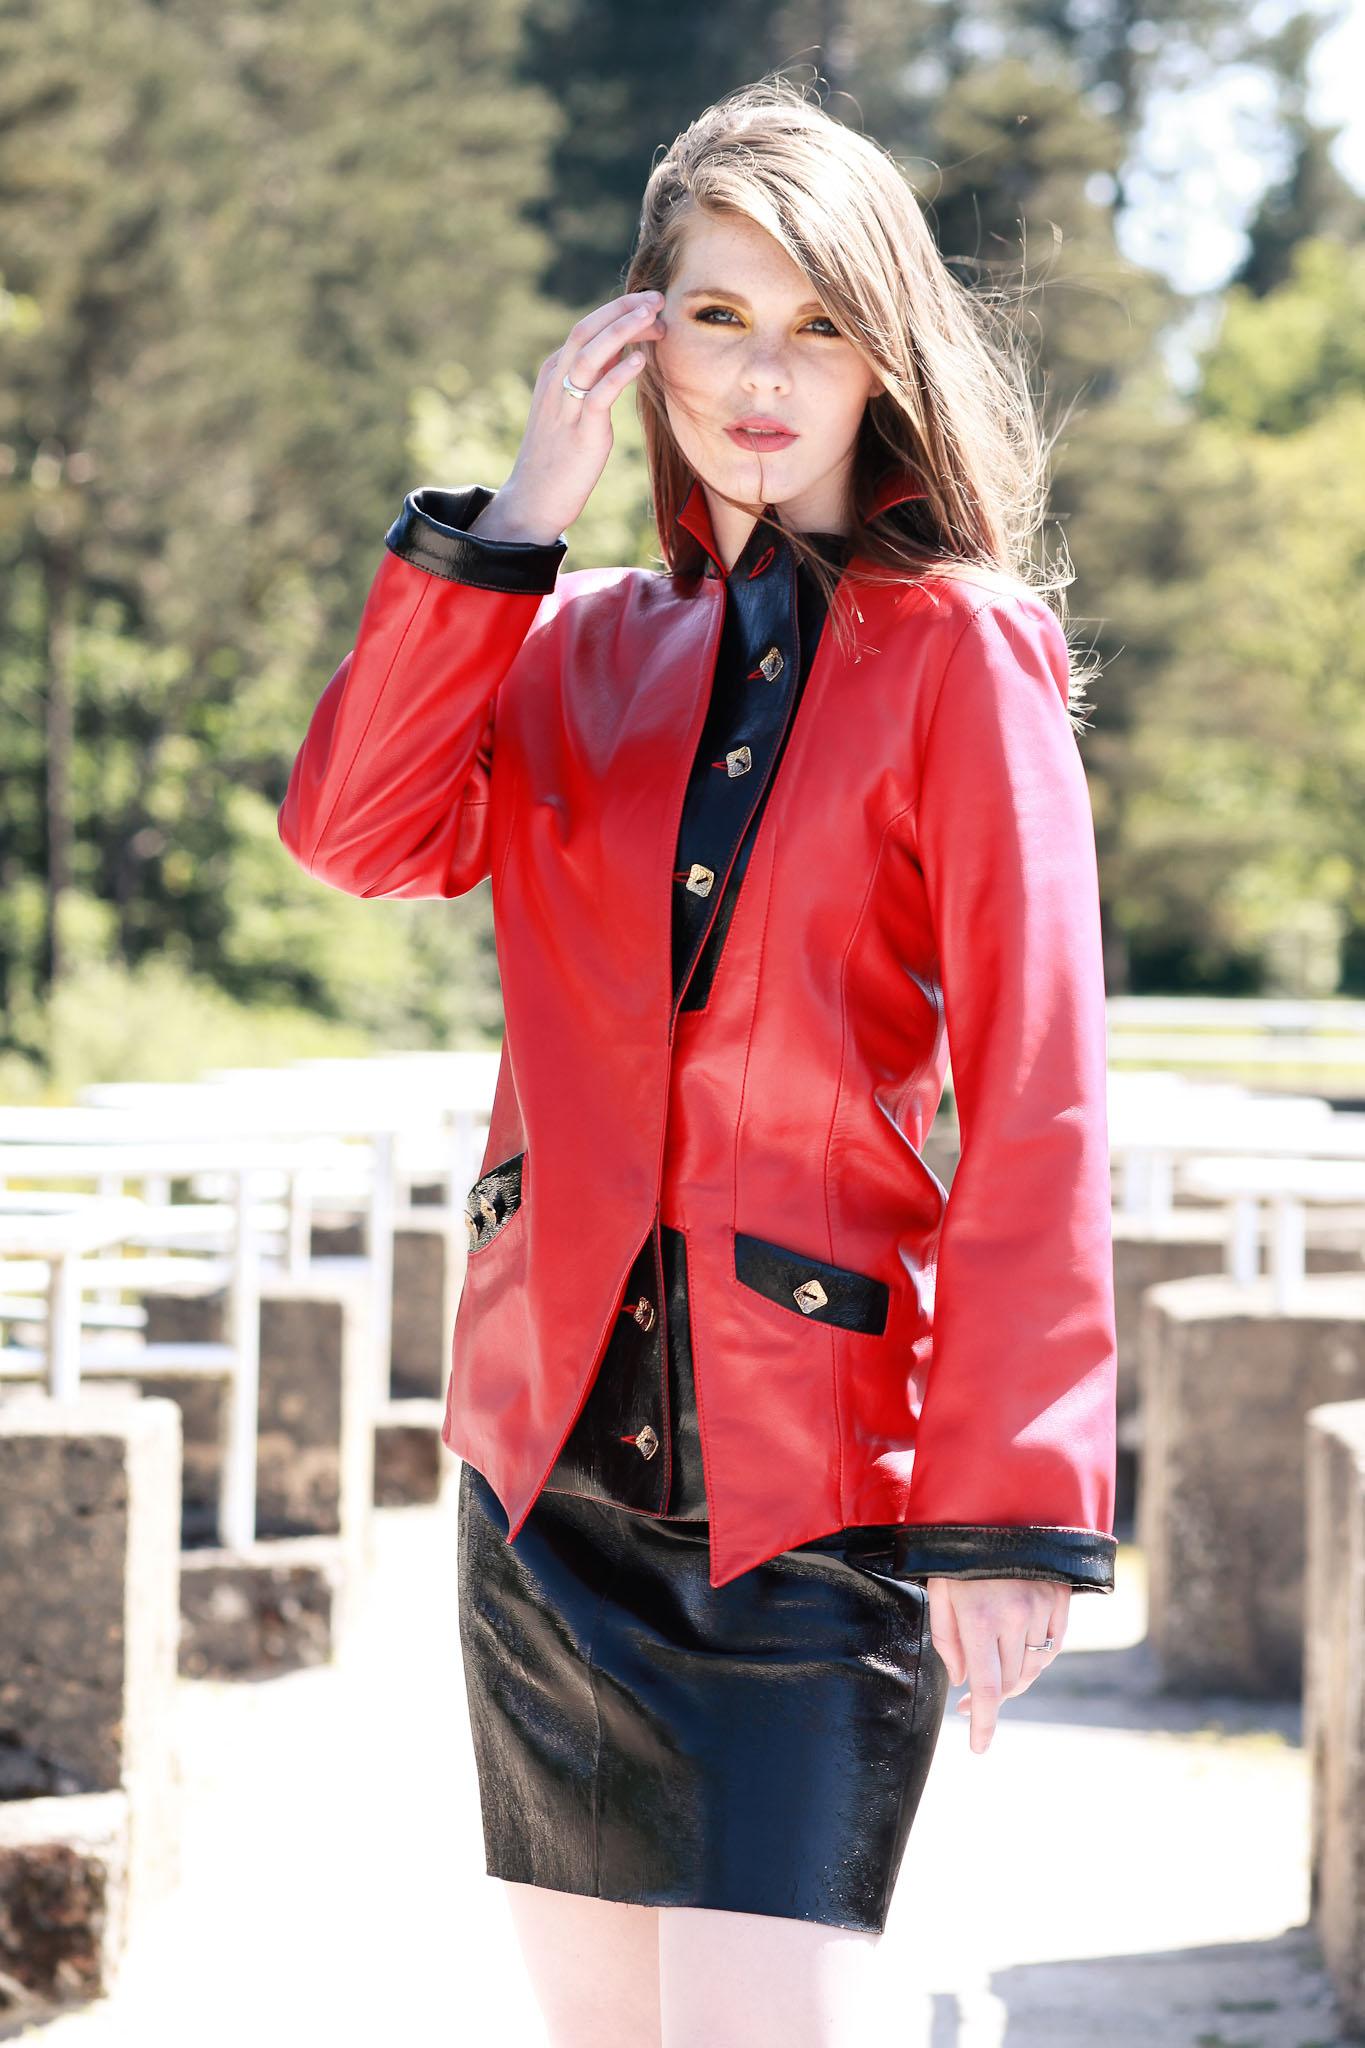 Manteau peau lainee femme amazon